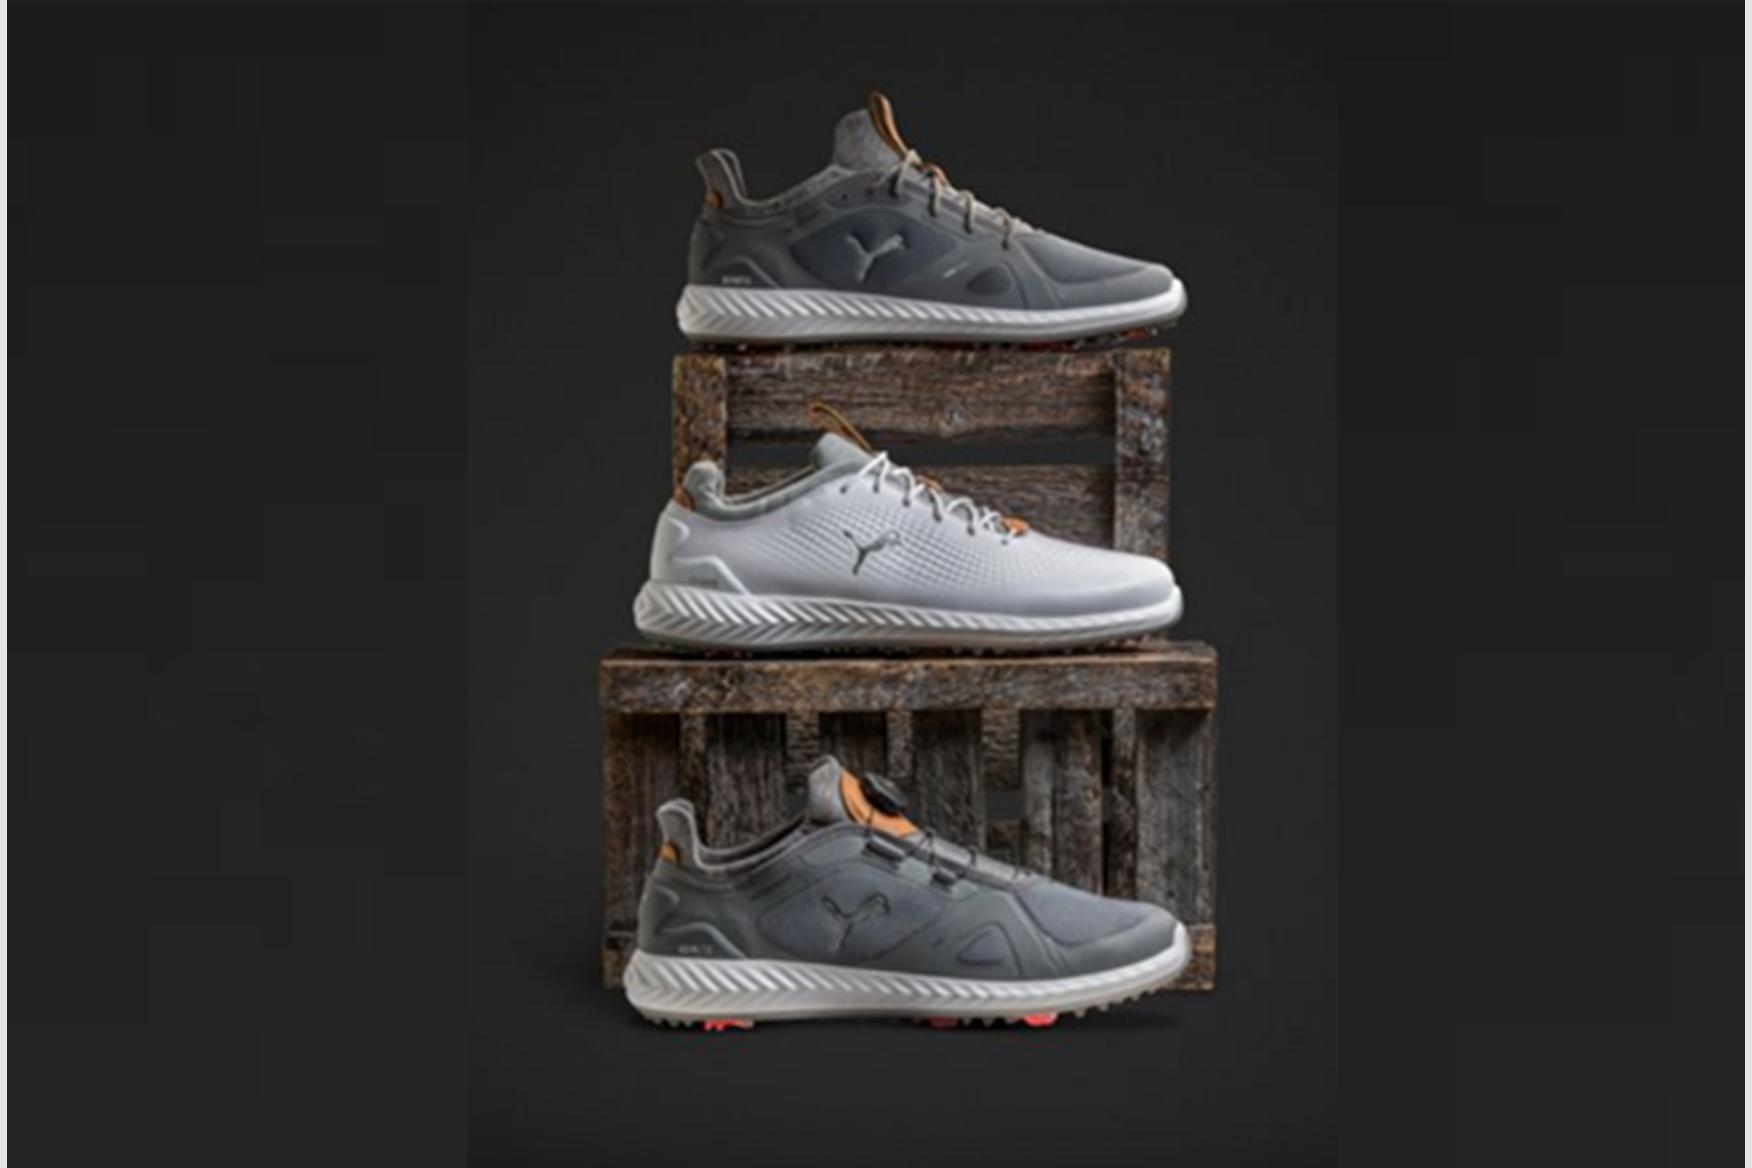 bf02b3005f6bb5 Puma PWDRADAPT Golf Shoes Review